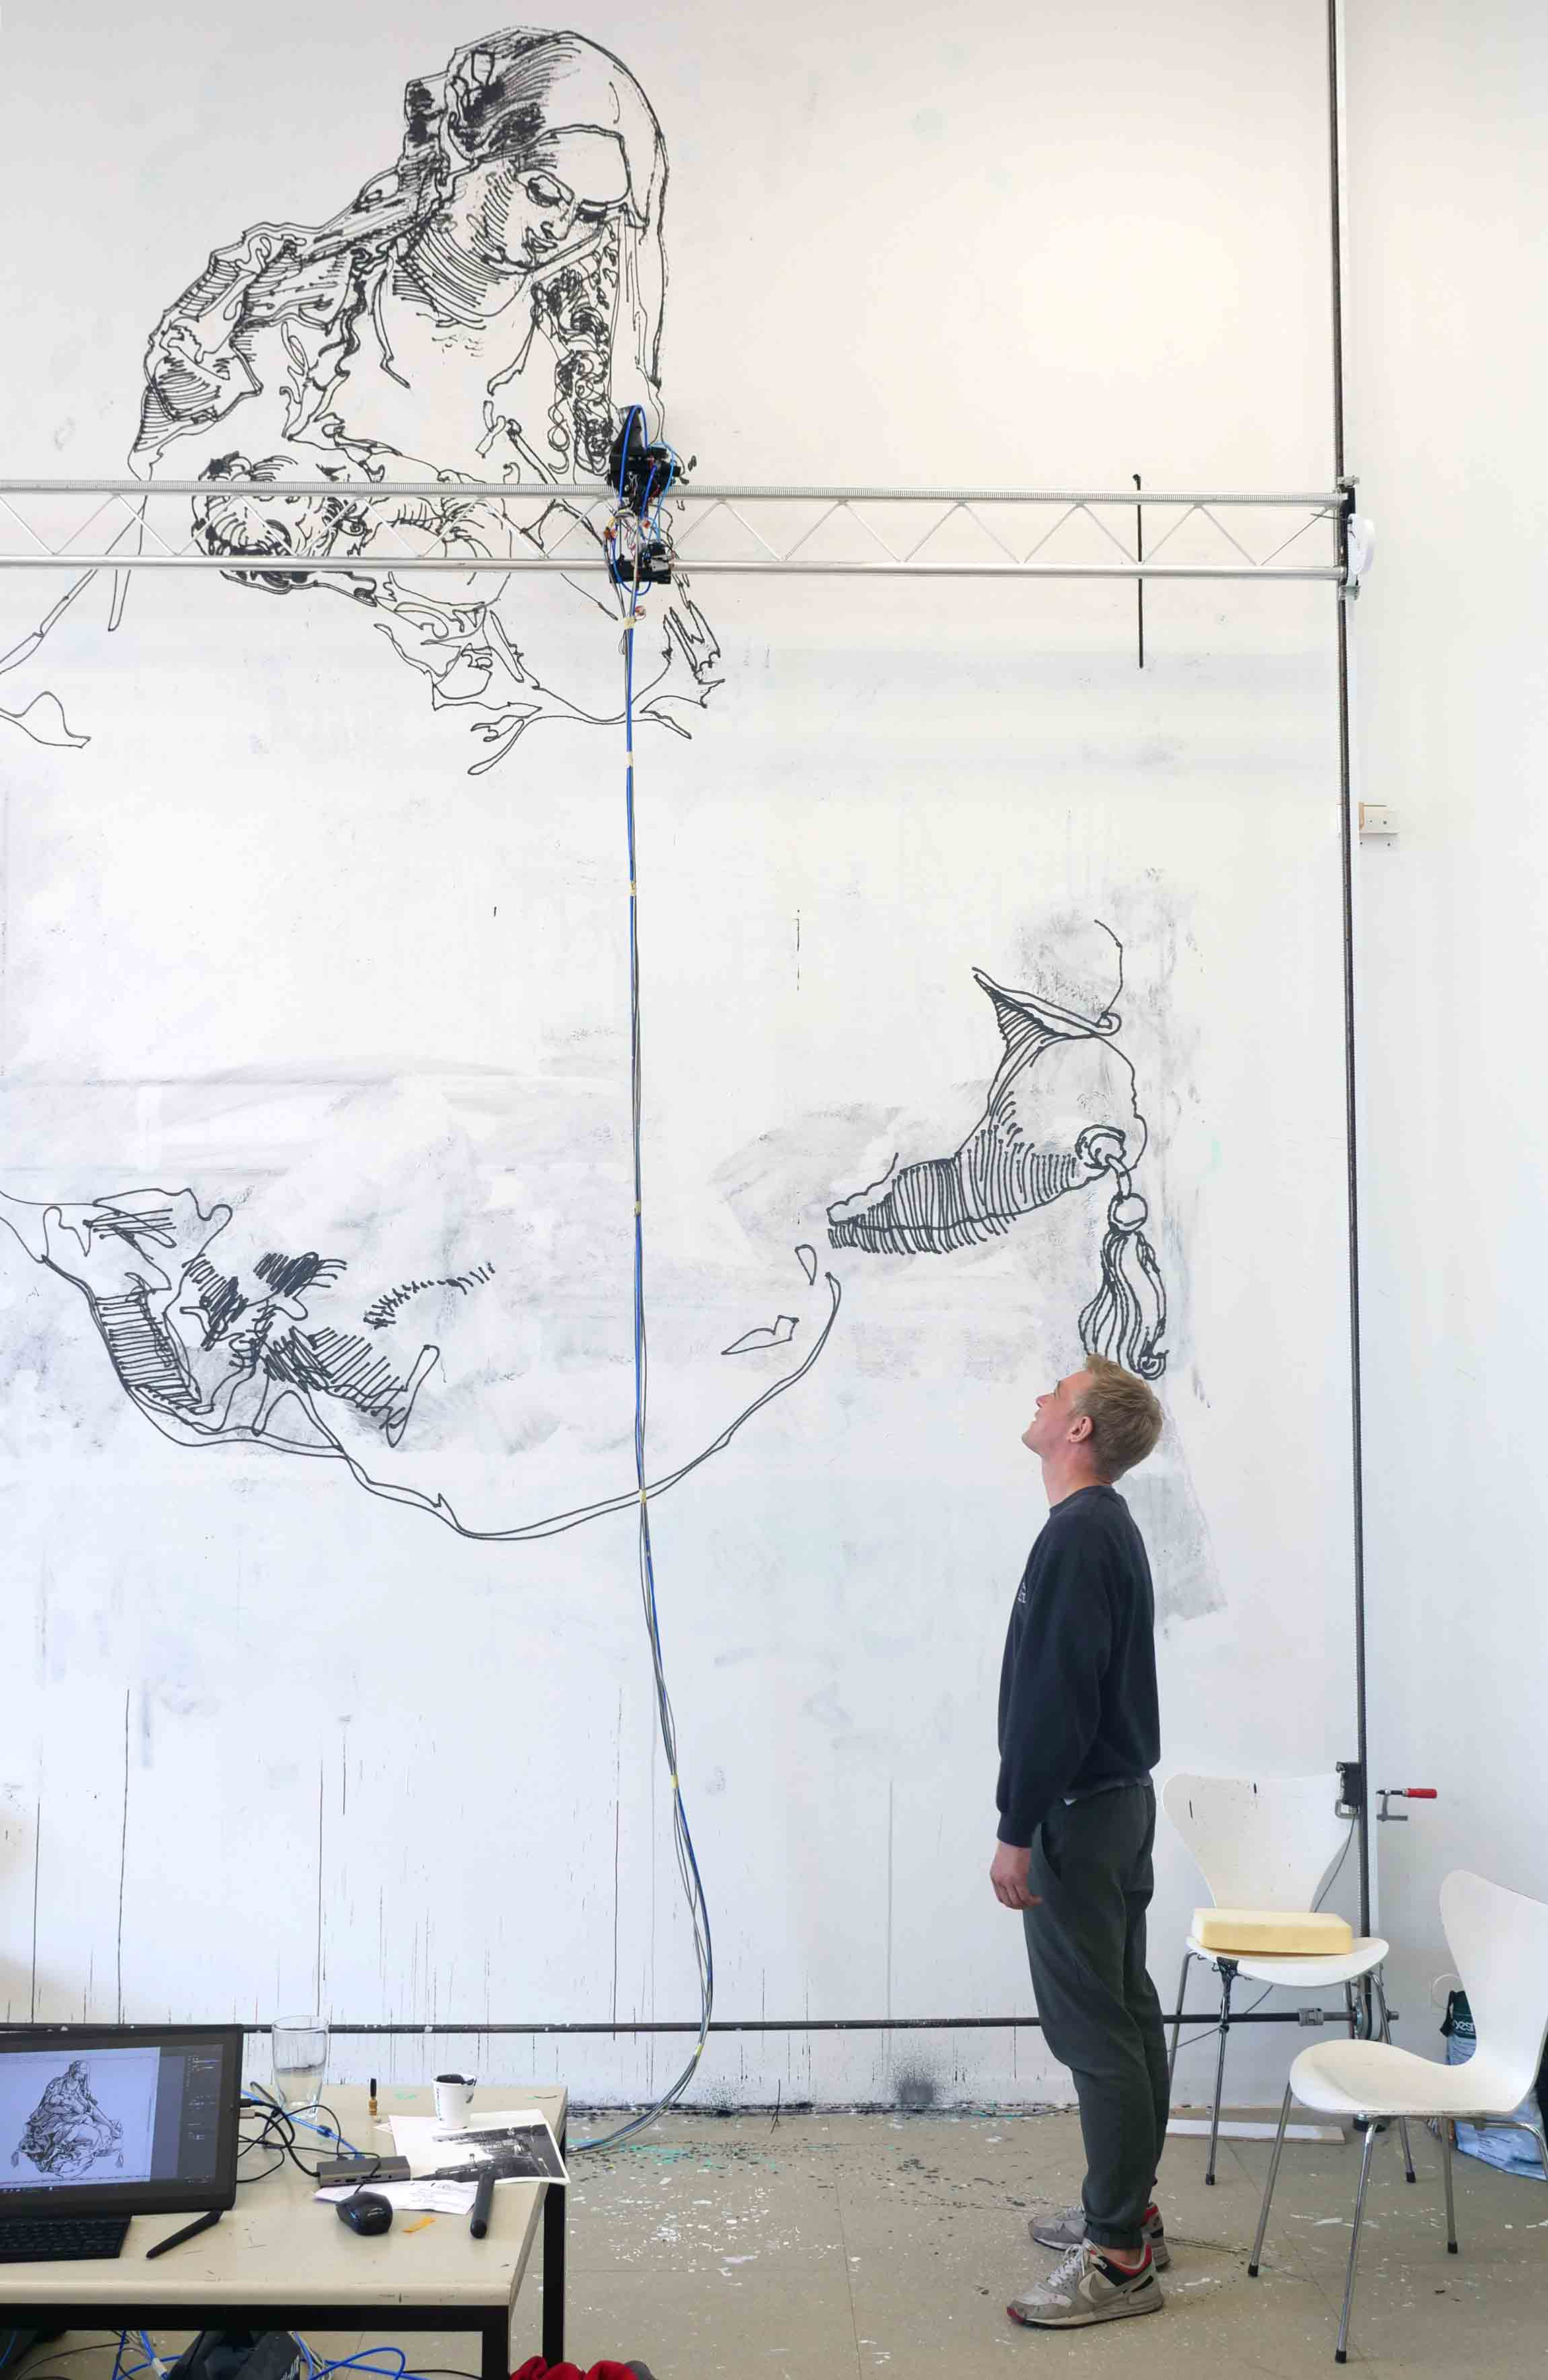 Gregor mit Spraybot Graffiti im Sprengel